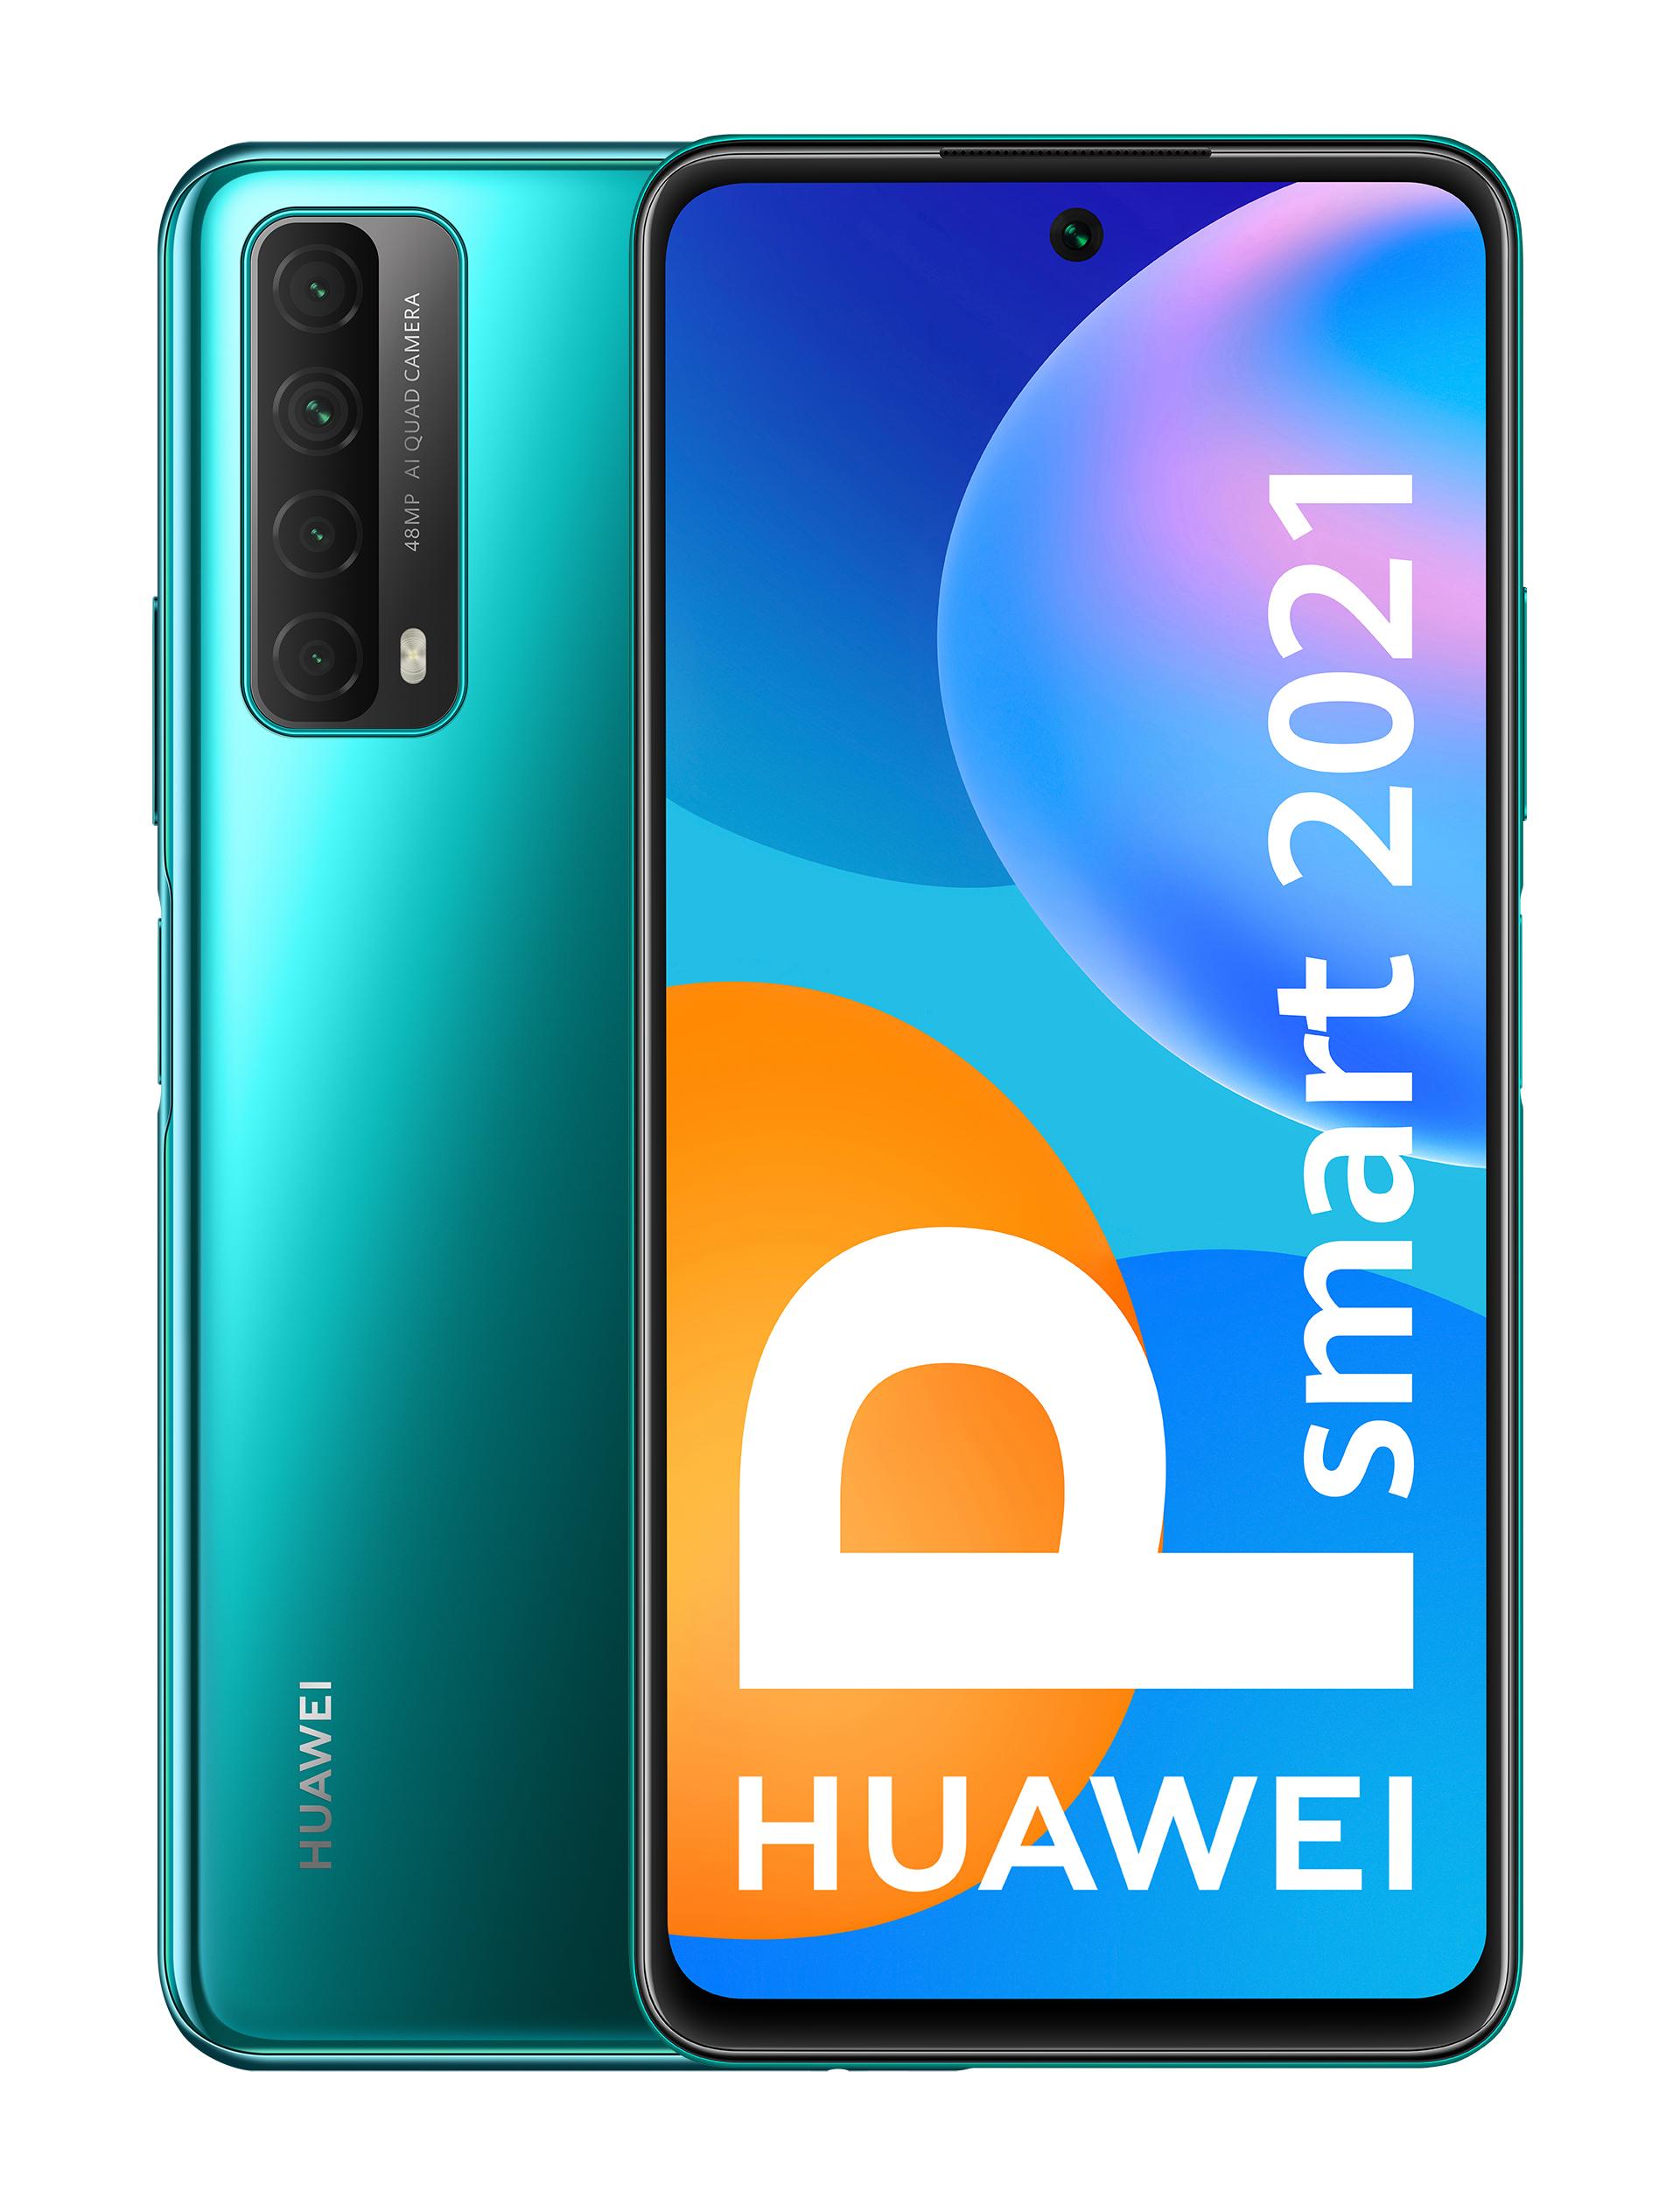 HUAWEI P smart 2021 Smartphone Kirin 710A /4GB/128GB/5000mAh/48MP for £149.99 delivered (using code) @ Huawei